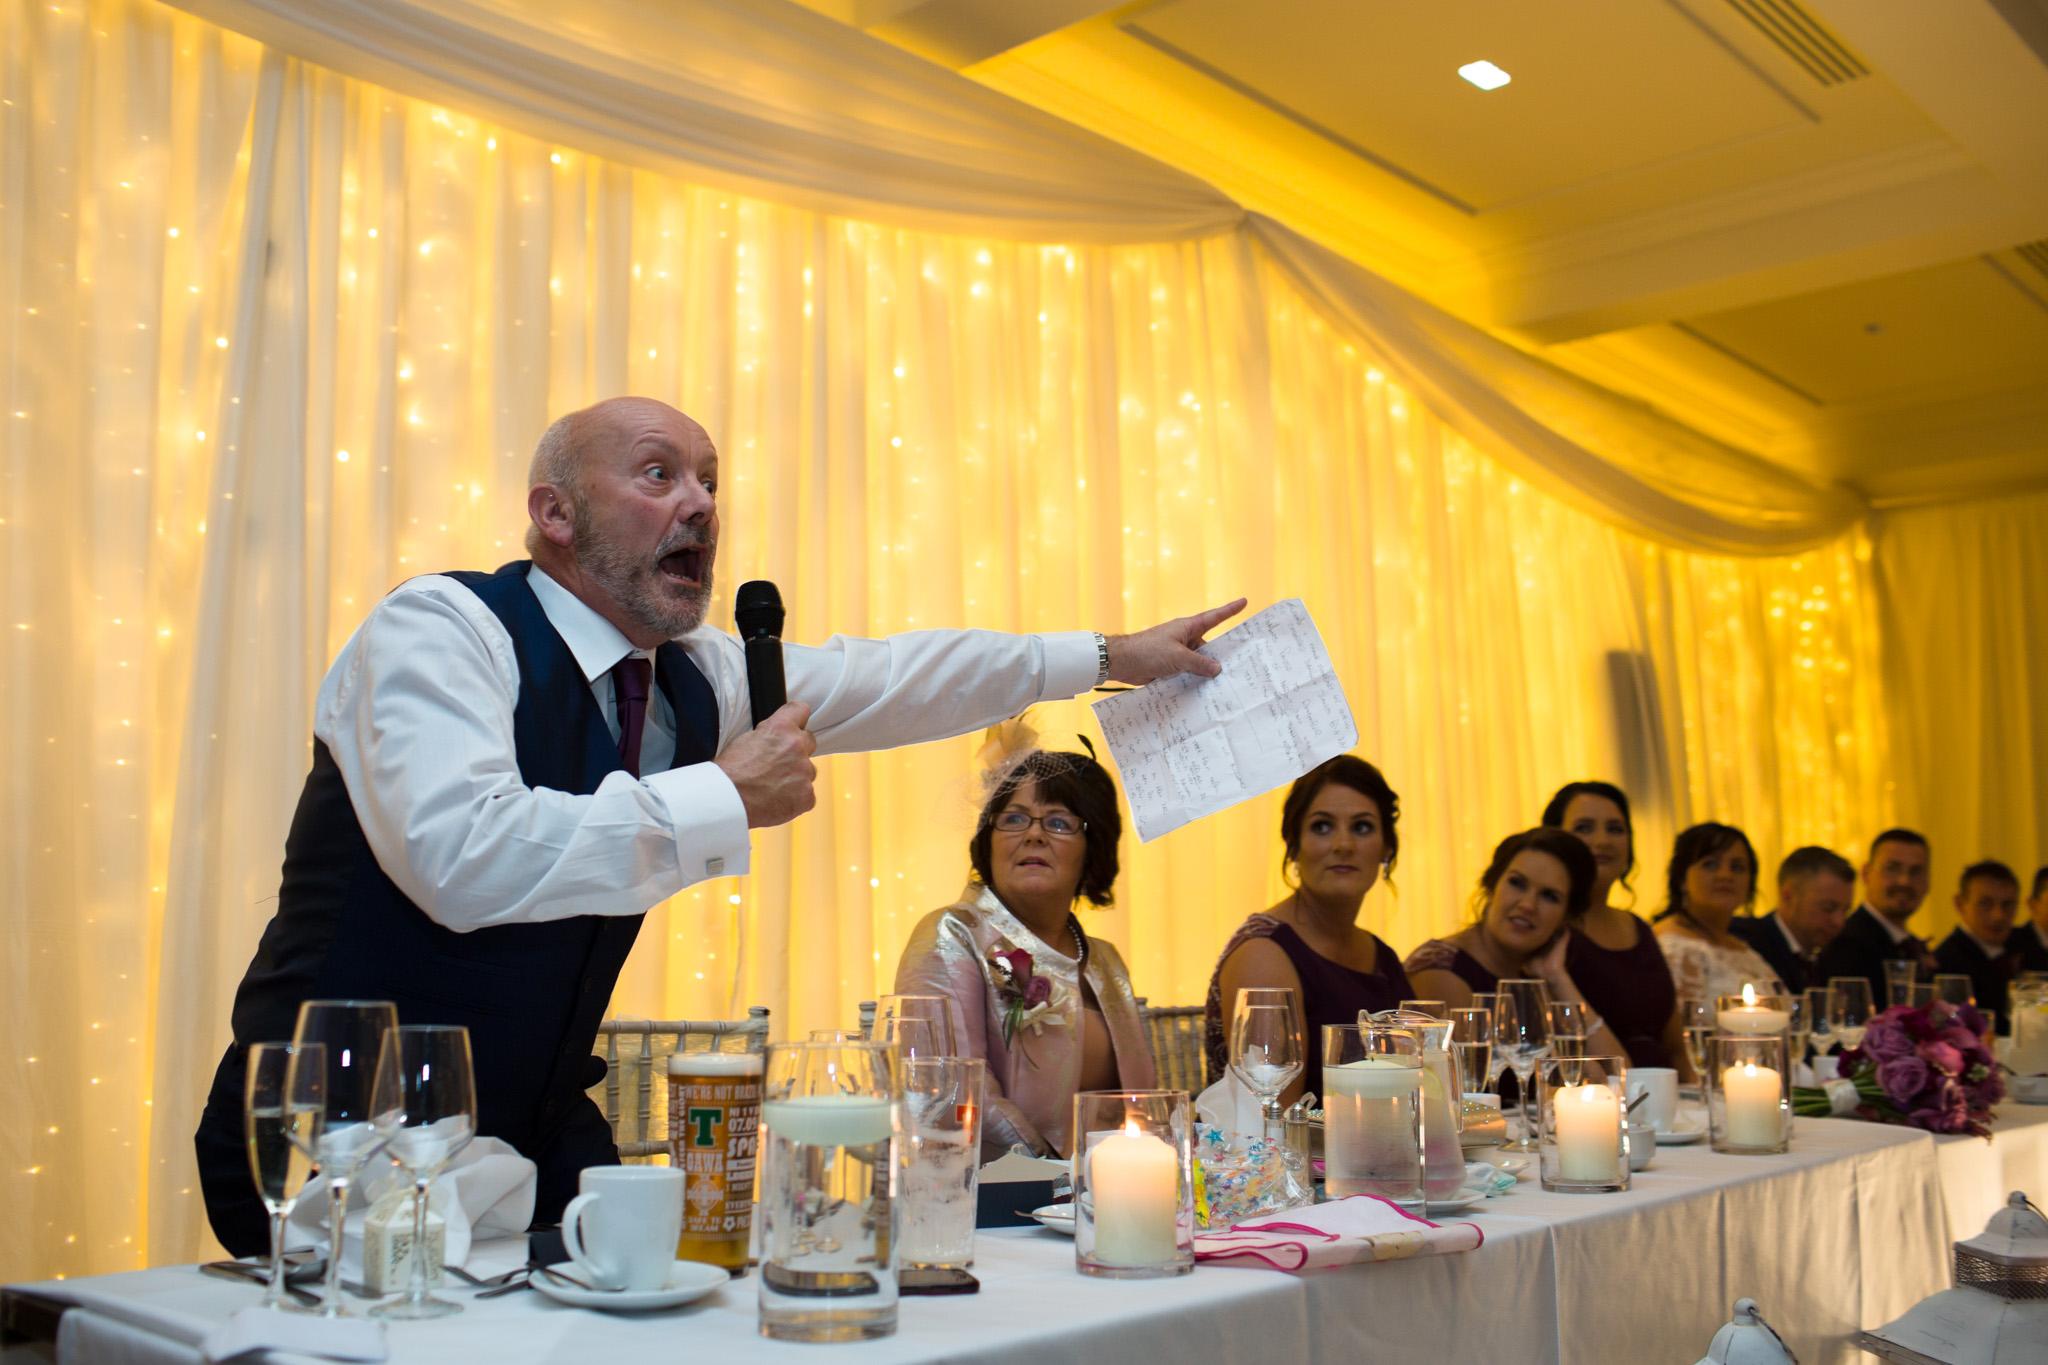 Mark_Barnes_Northern_Ireland_Wedding_Photography_Marine_hotel_ballycastle_Wedding_Photography_Janet&Darren-34.jpg